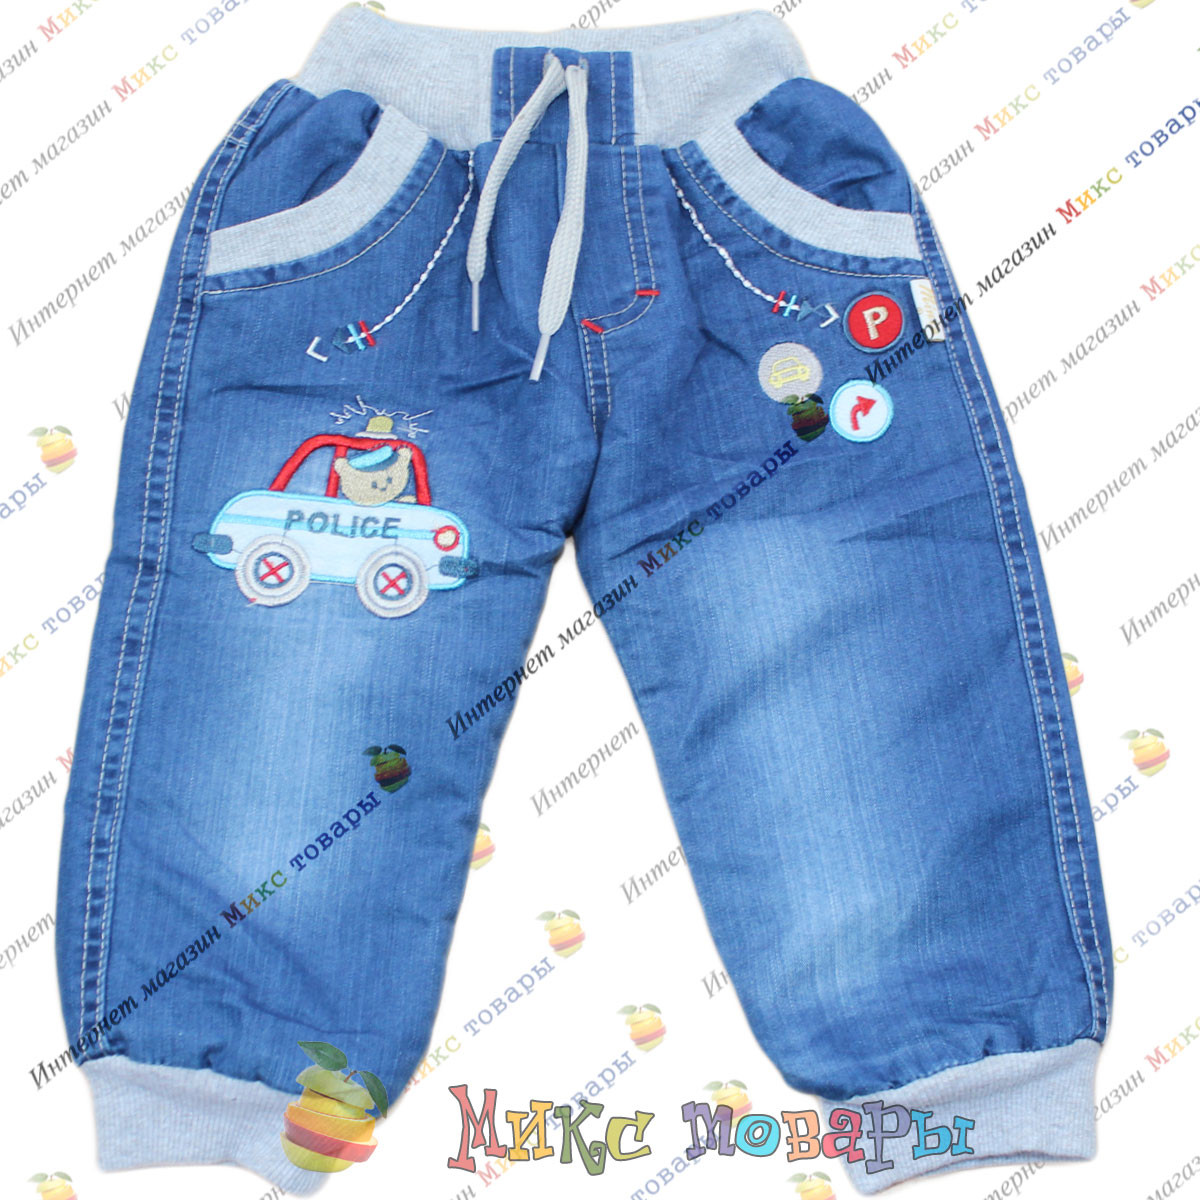 Тёплые джинсы для мальчика Возраст: 6- 24 месяца (3681)